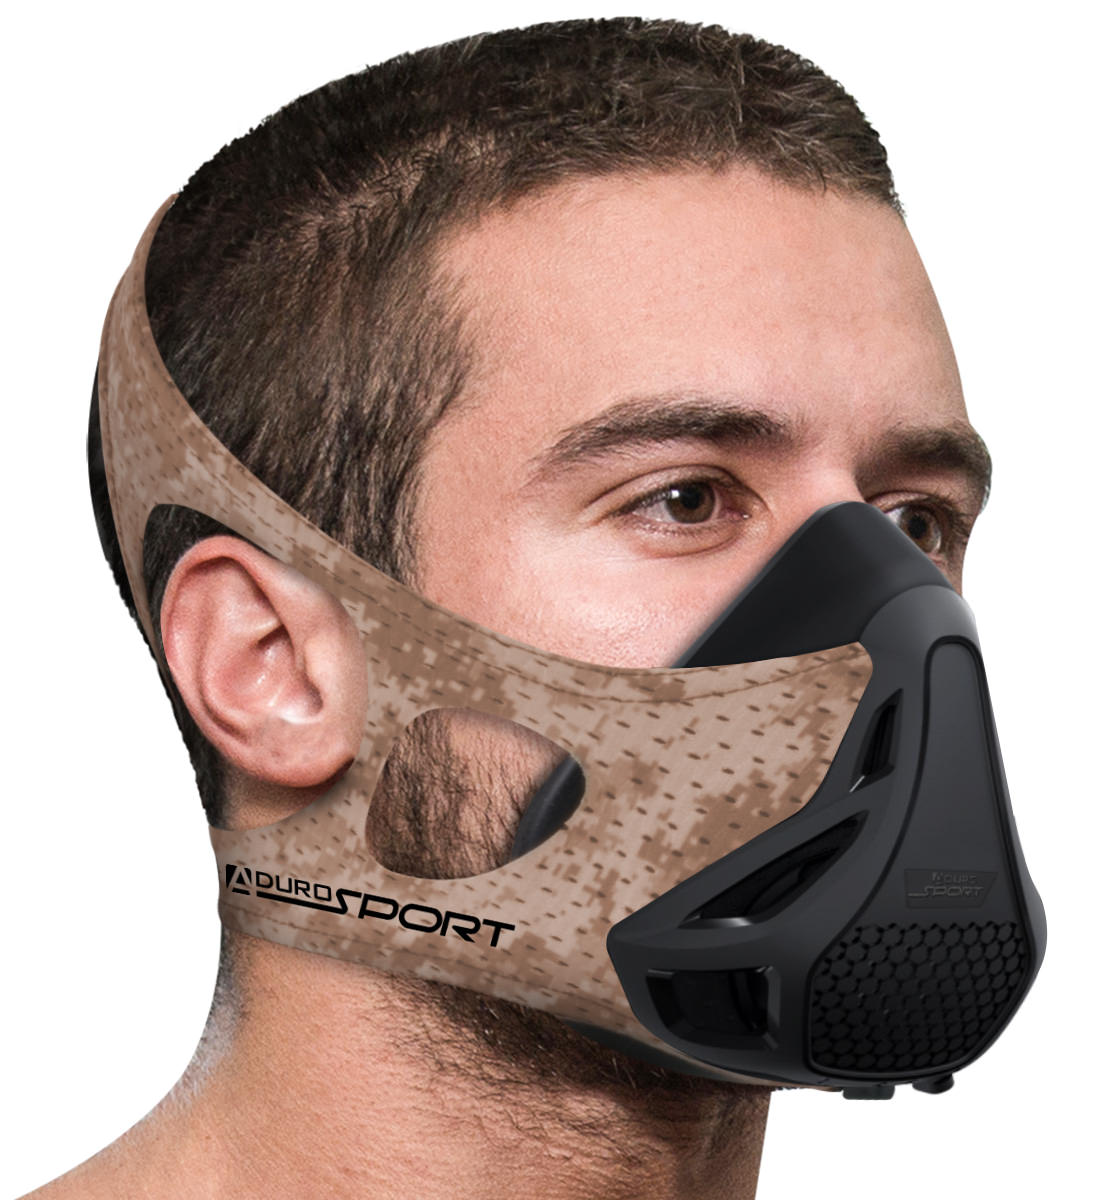 Image of Peak Resistance High Altitude Training Mask